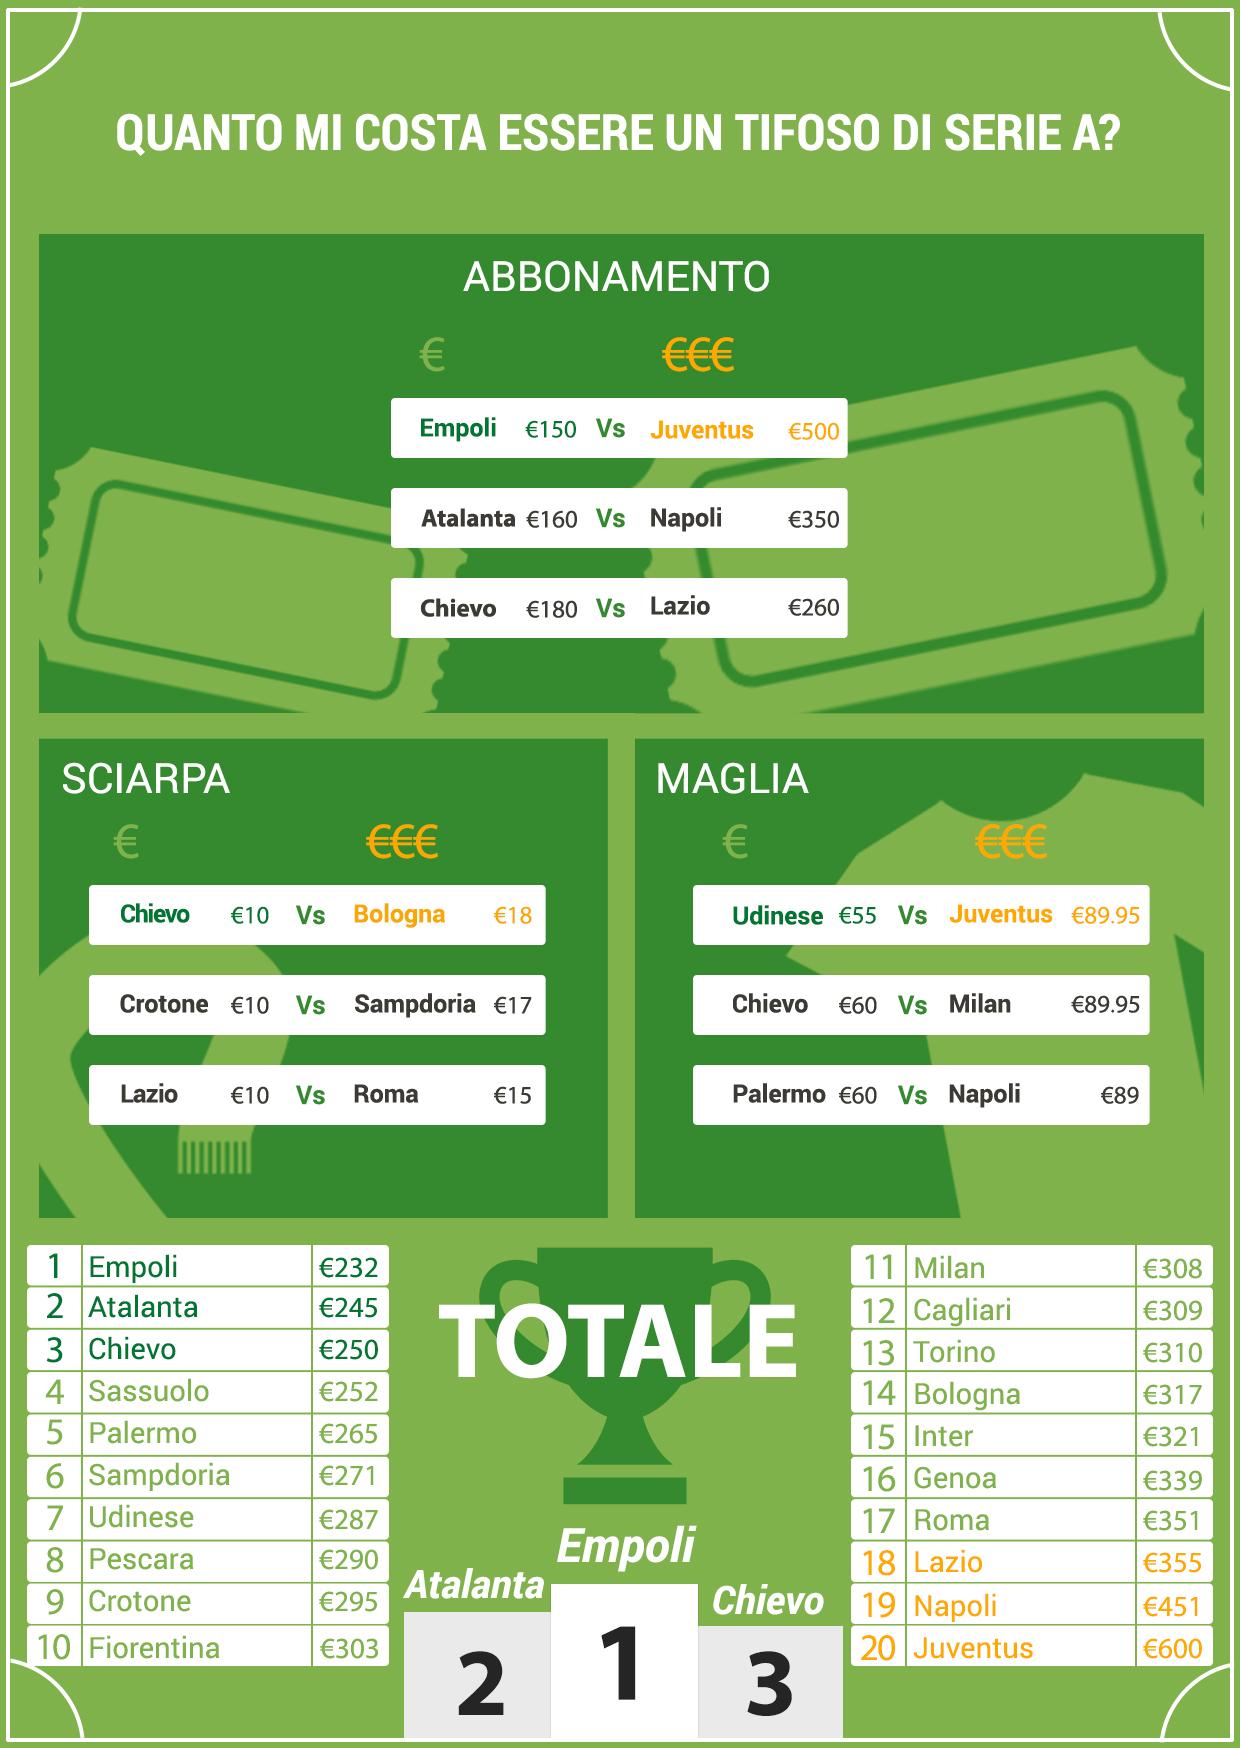 Infografica_studio_costi_serieA